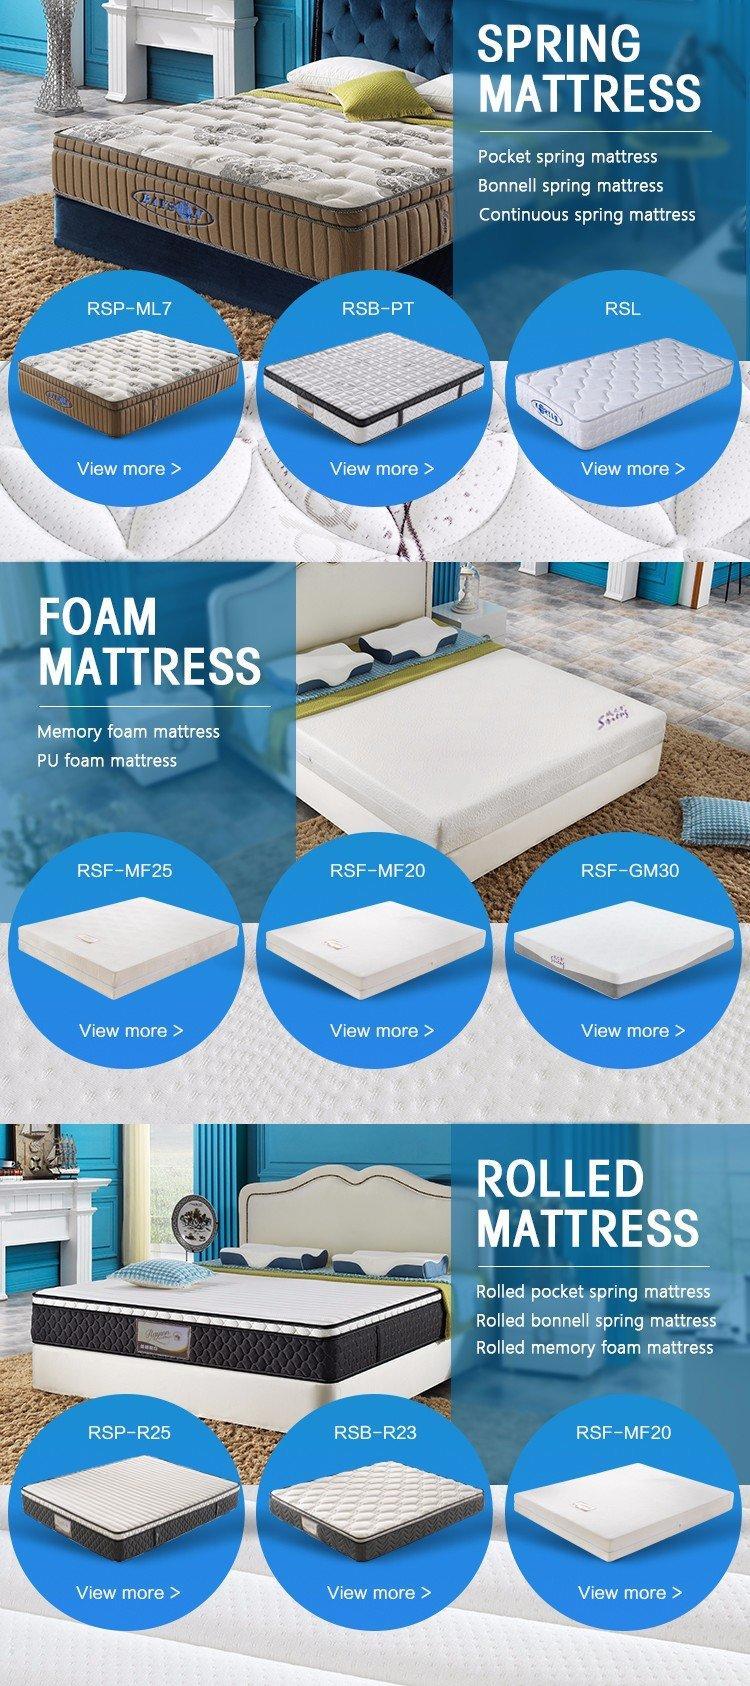 Rayson Mattress encased is foam mattress better than spring manufacturers